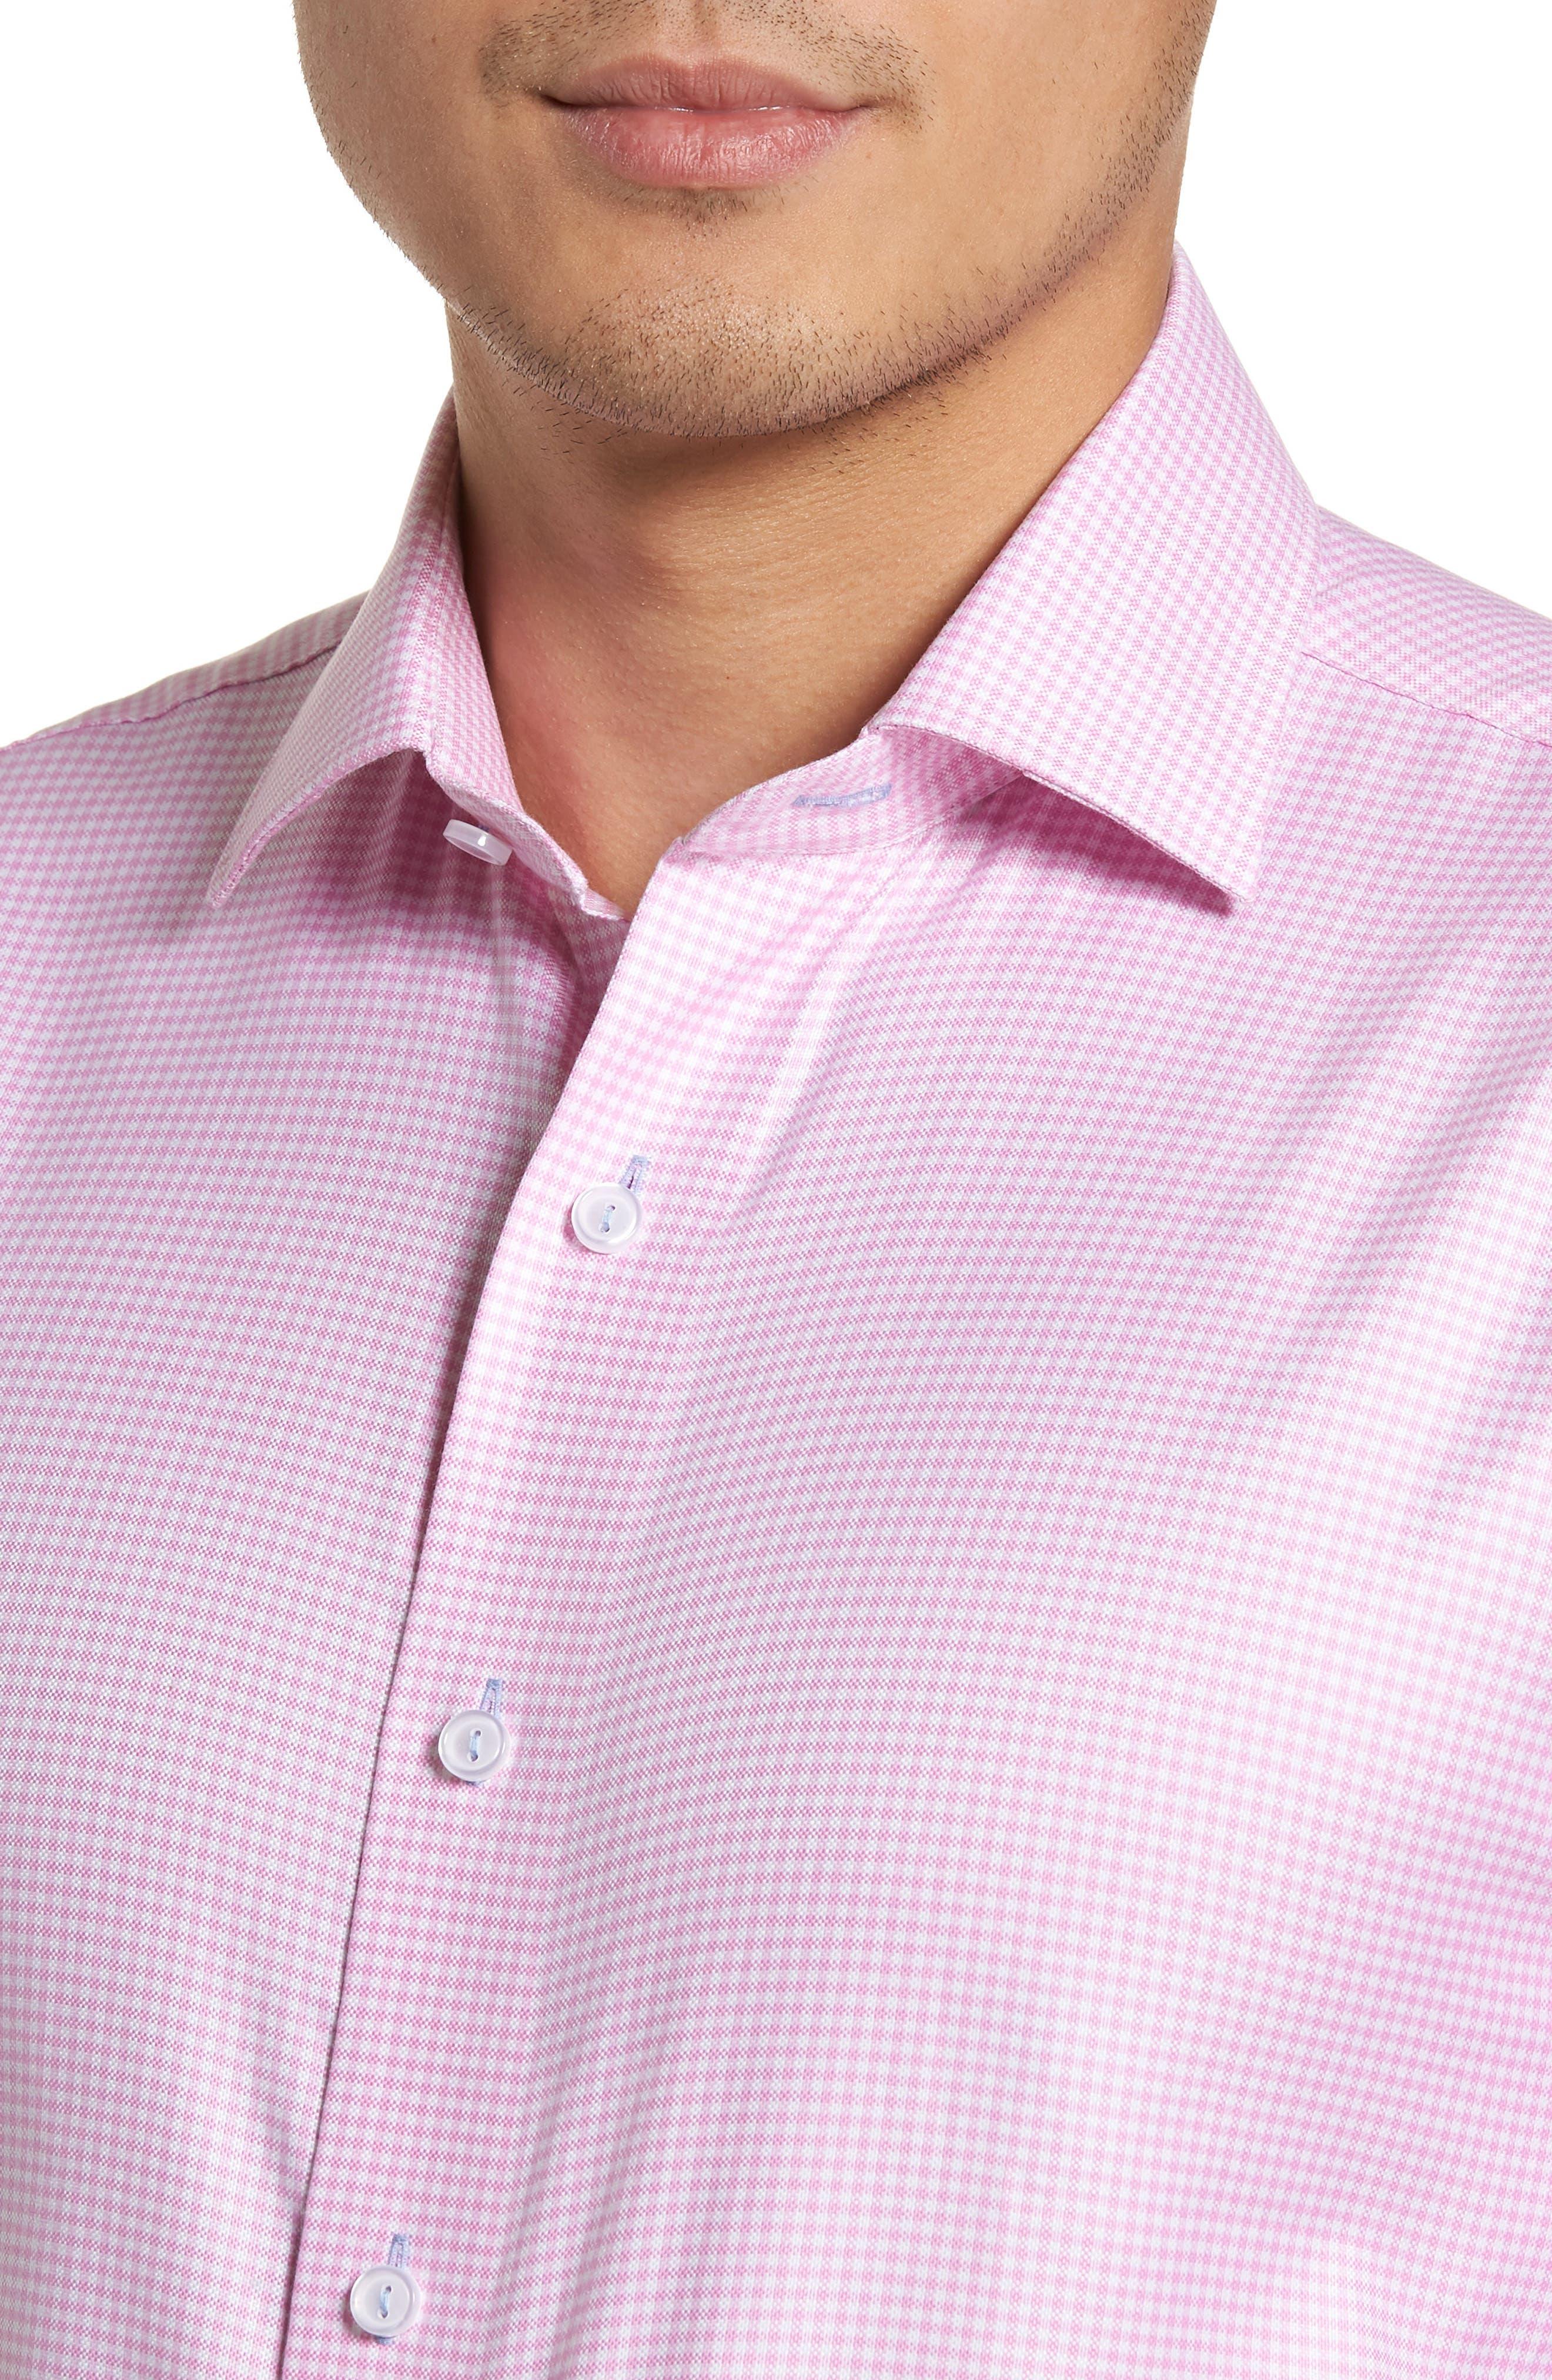 Trim Fit Textured Gingham Dress Shirt,                             Alternate thumbnail 2, color,                             Pink